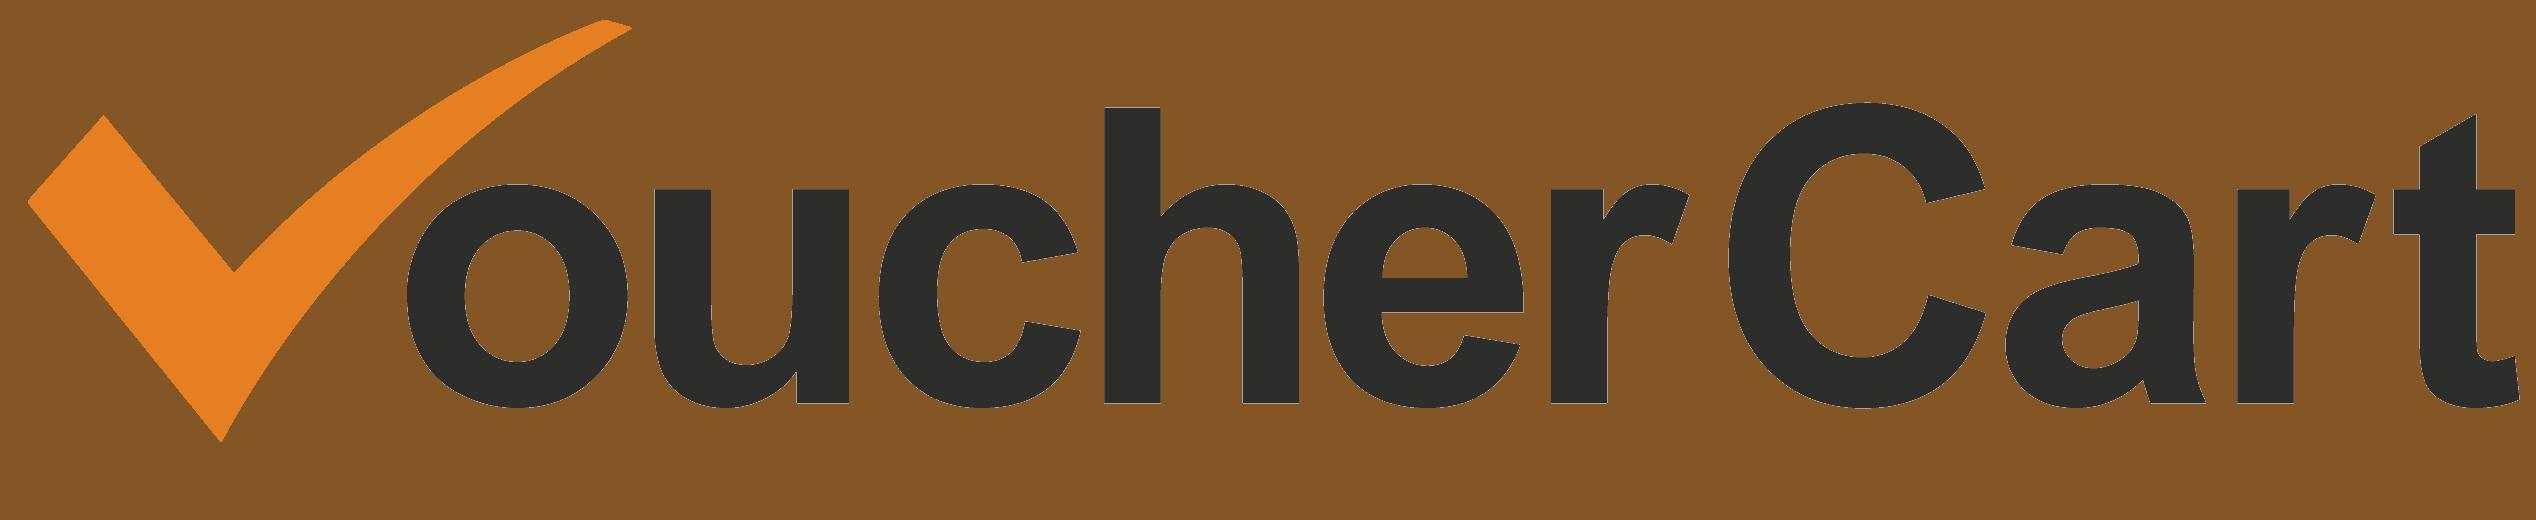 Vouchercart Company Logo